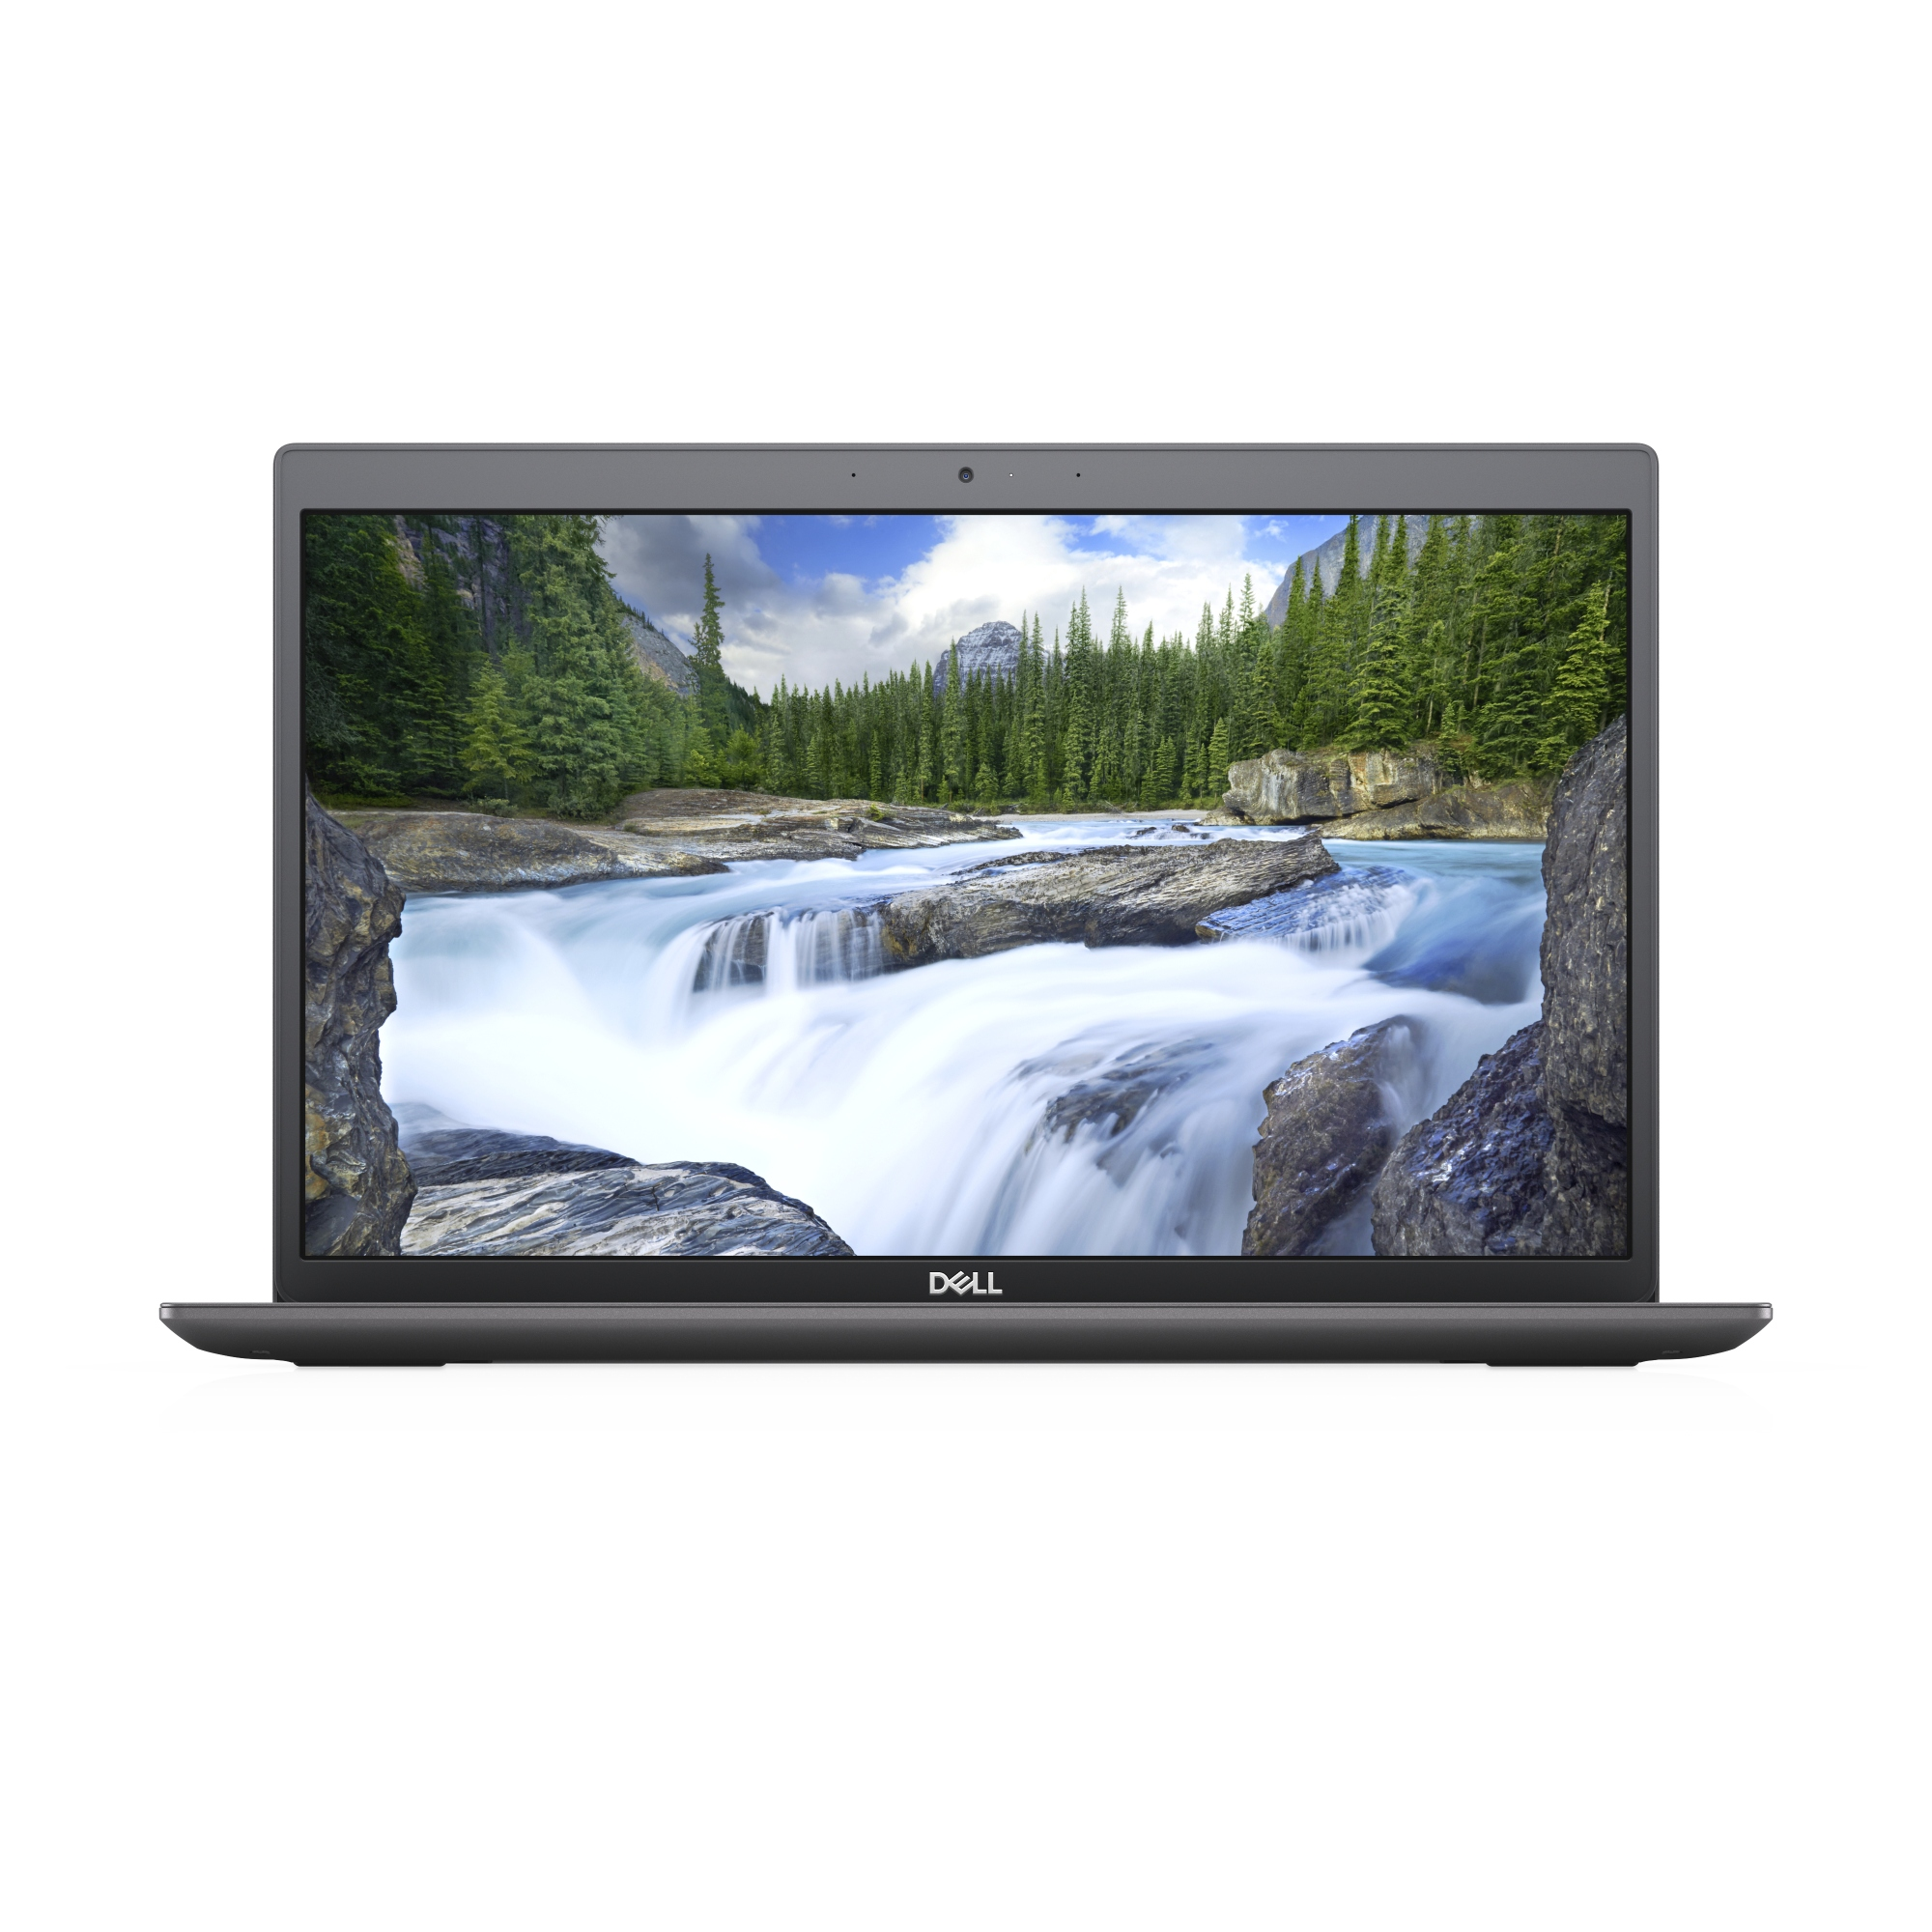 "LATITUDE 3301 NEGRO PORTáTIL 33,8 CM (13.3"") 1366 X 768 PIXELES 8ª GENERACIóN DE PROCESADORES INTEL® CORE™ I5 8 GB LPDDR3-SDRAM 256 GB SSD WINDOWS 10 PRO"